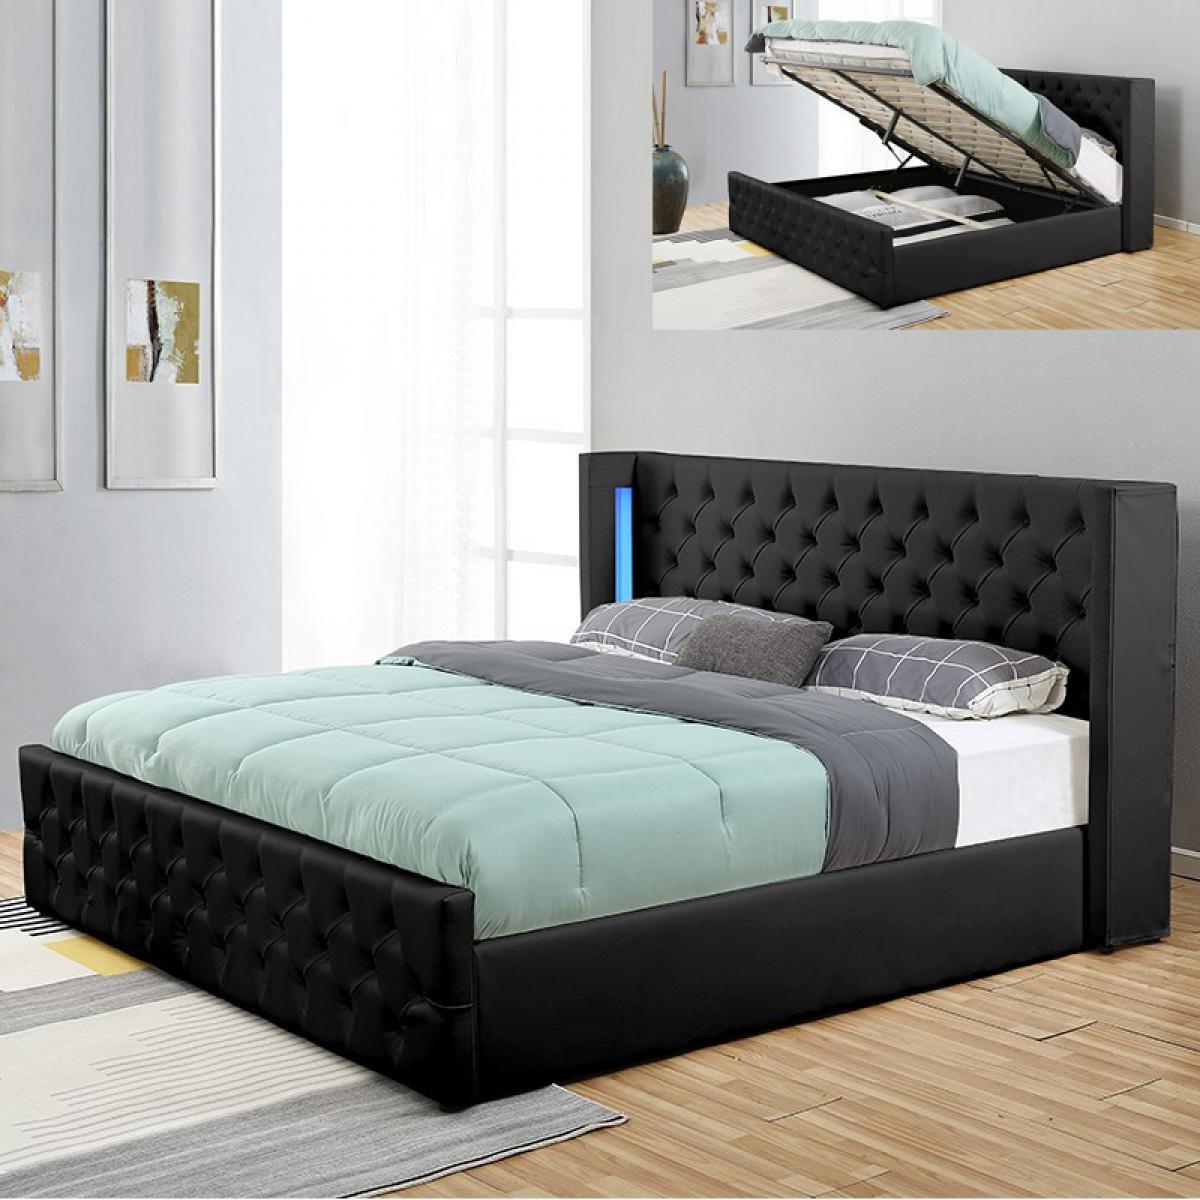 Meubler Design Lit coffre design avec led OSMOS - Noir - 180x200